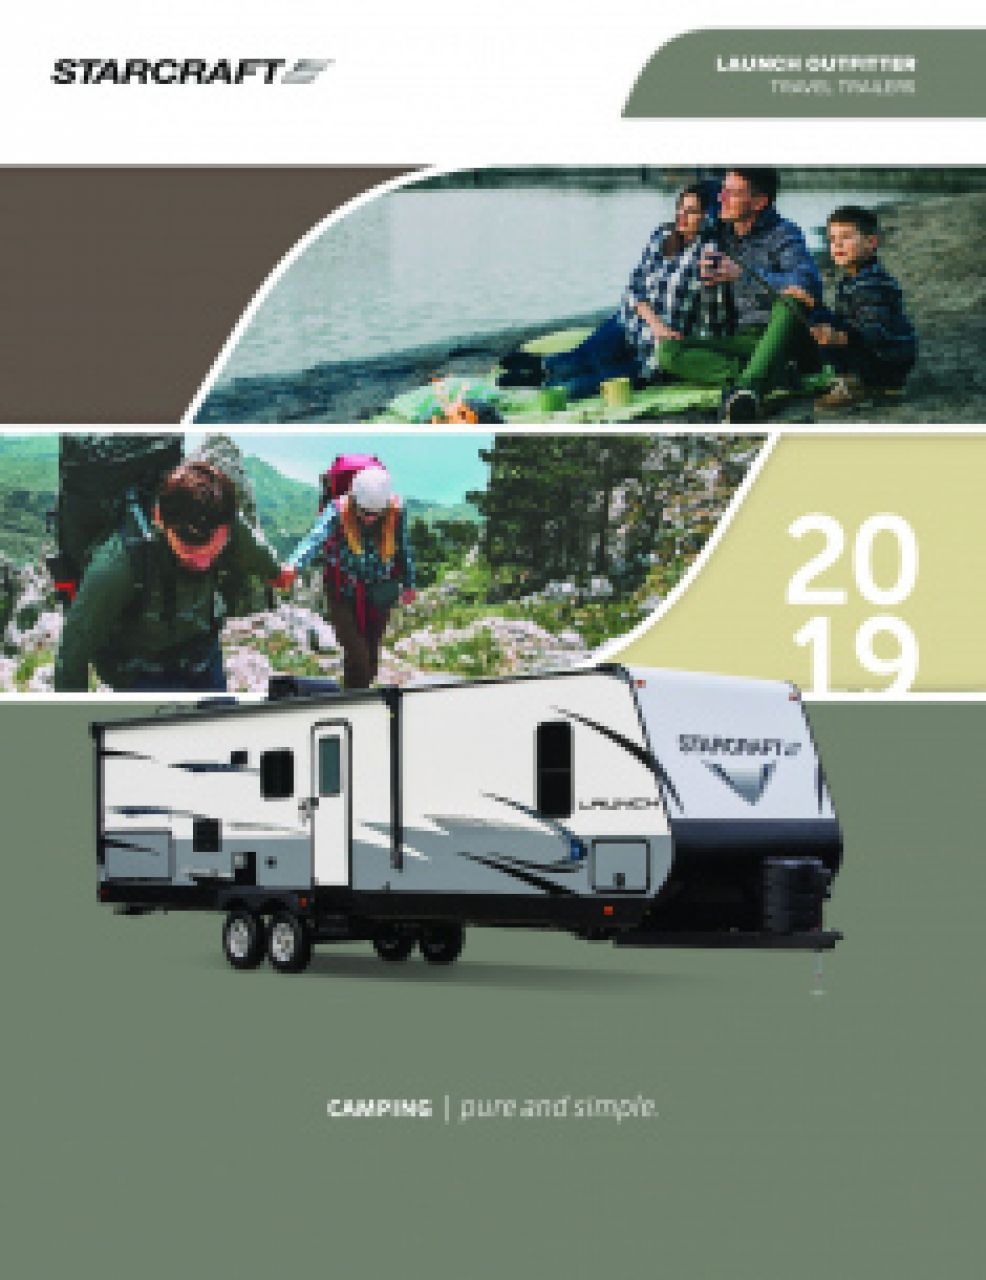 launchoutfitter-2019-broch-lsrv-pdf